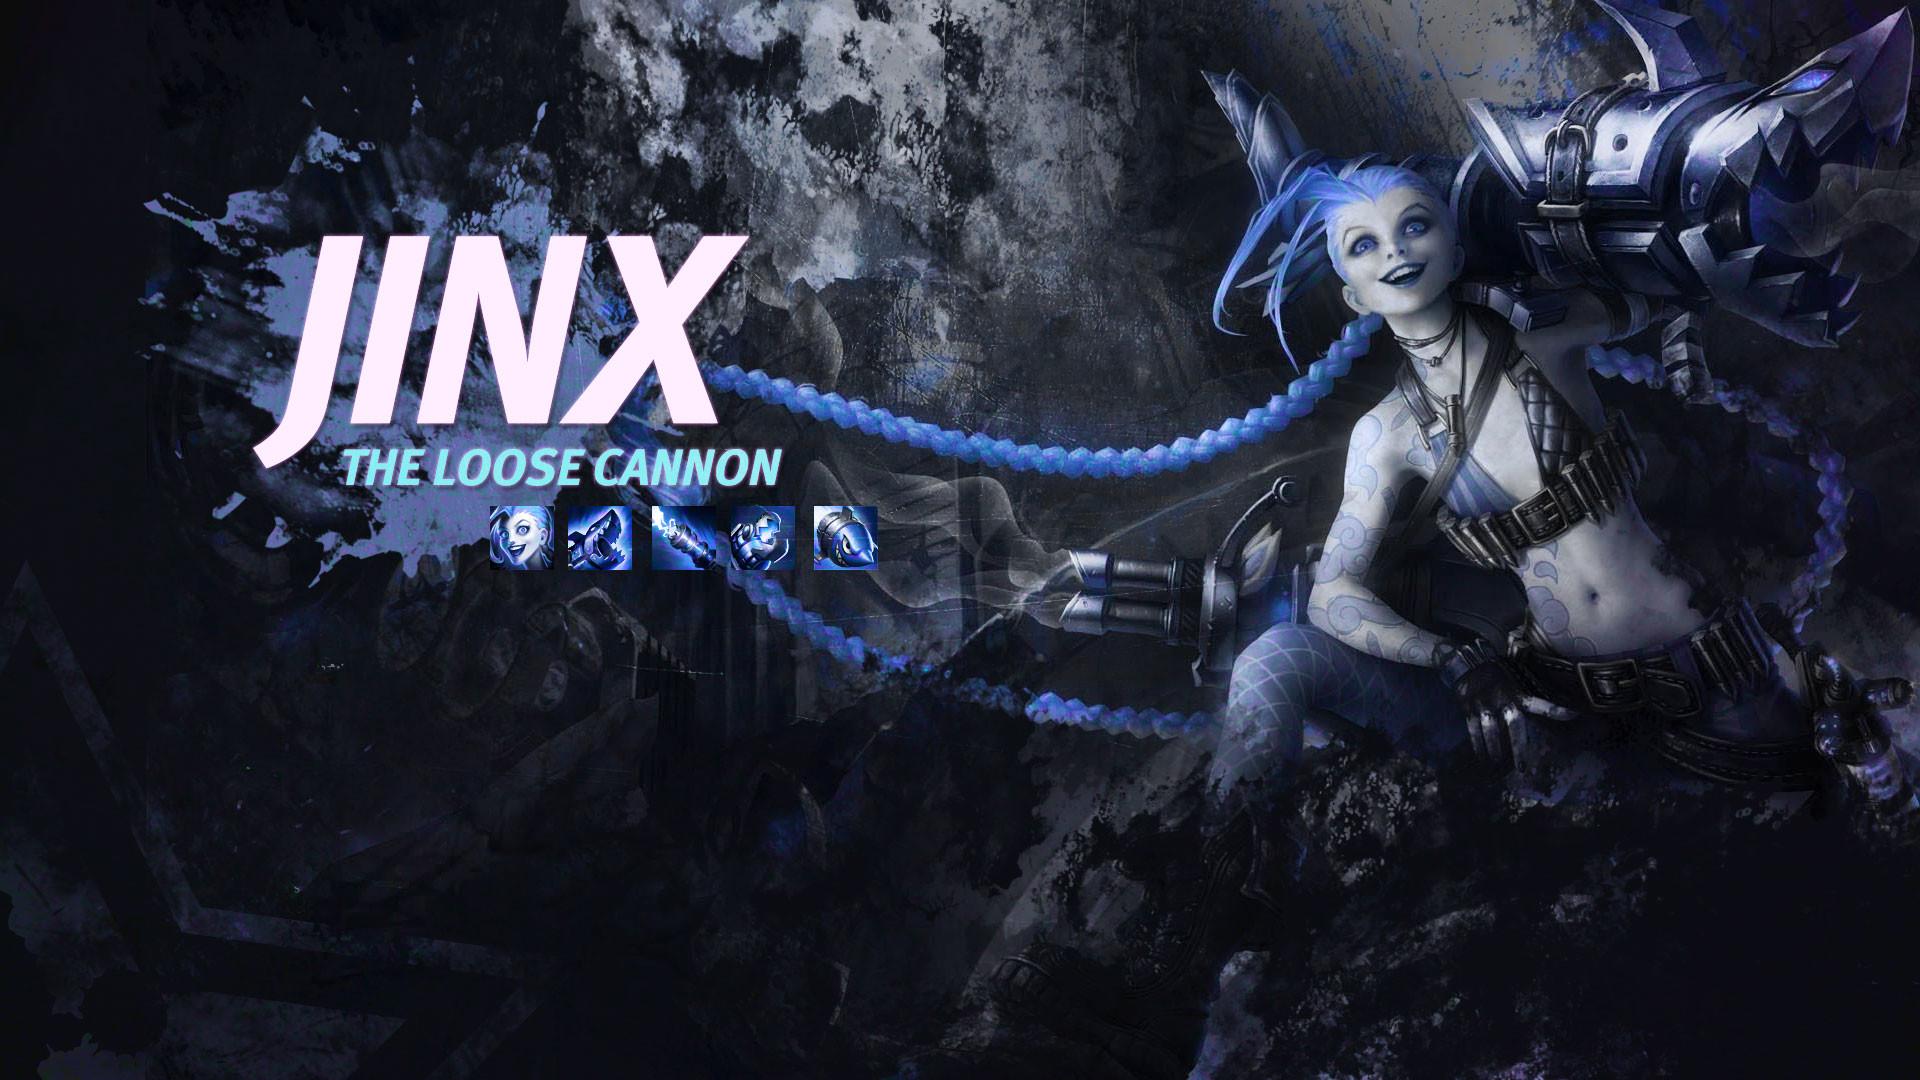 Ipad Images of Jinx by Amerigo Nazer